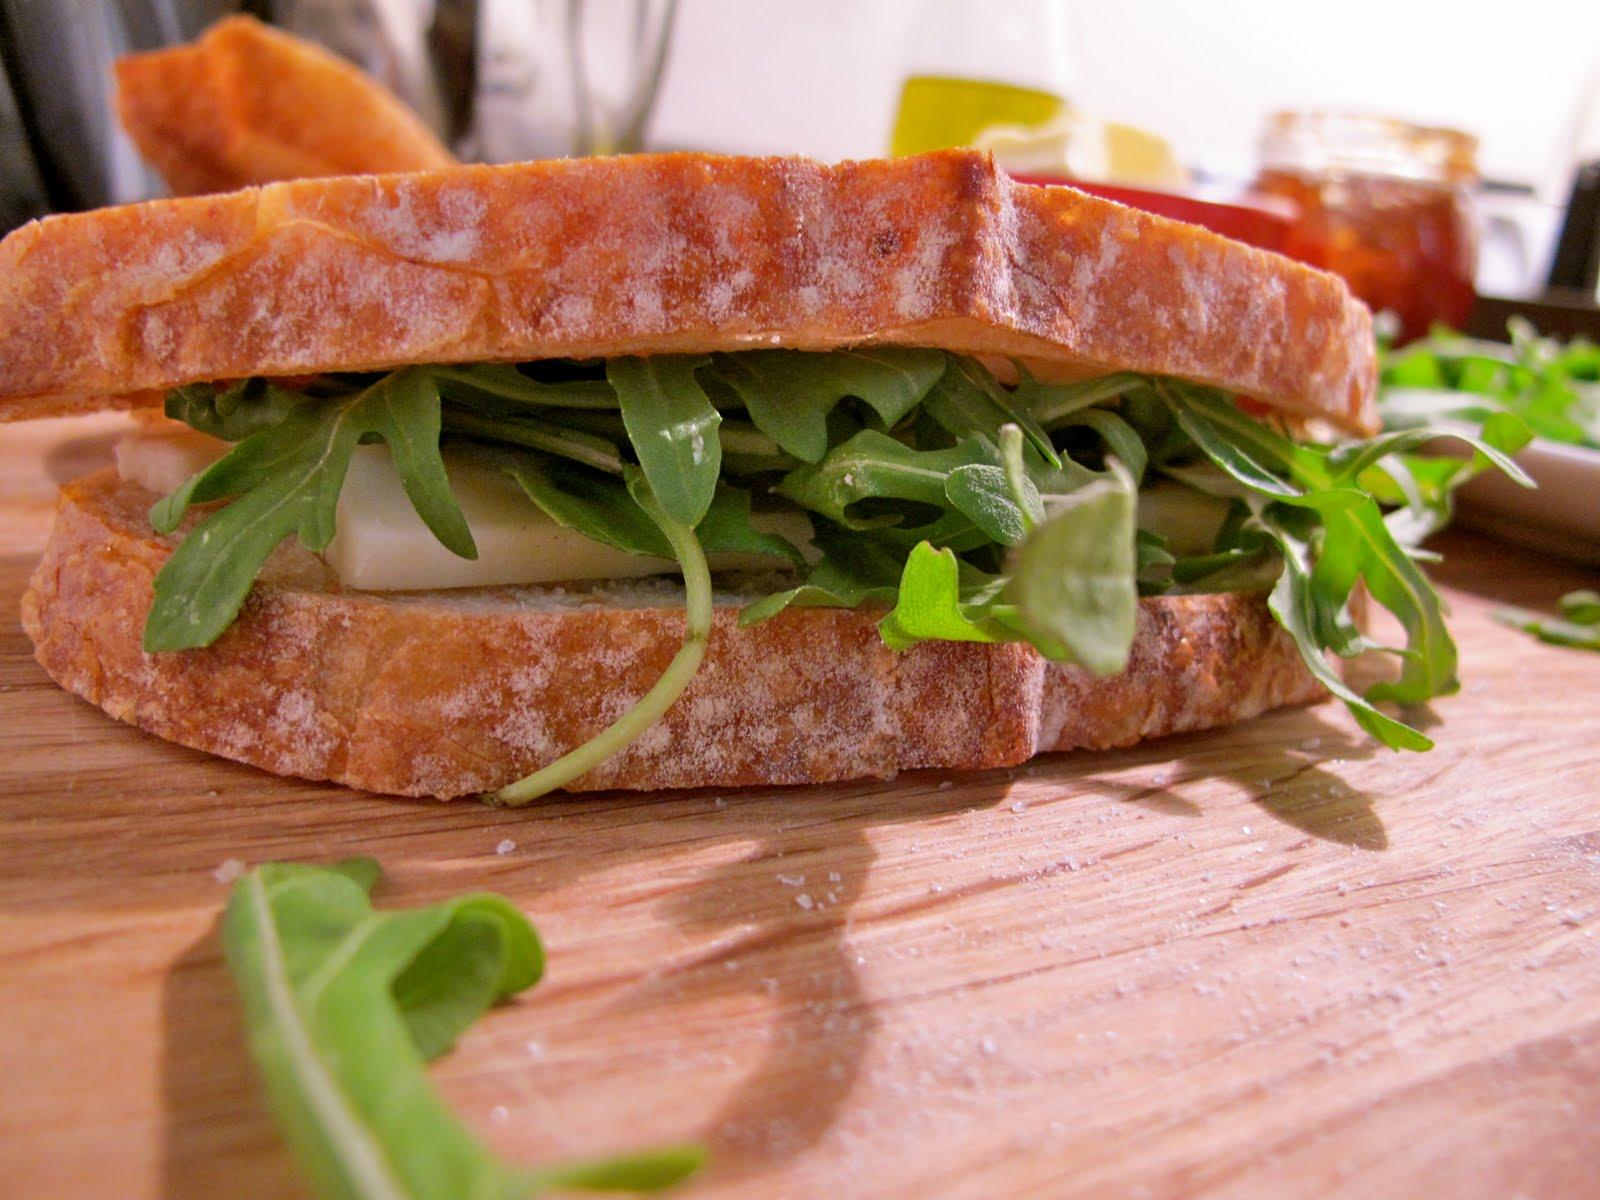 Sottocenere Whole Foods